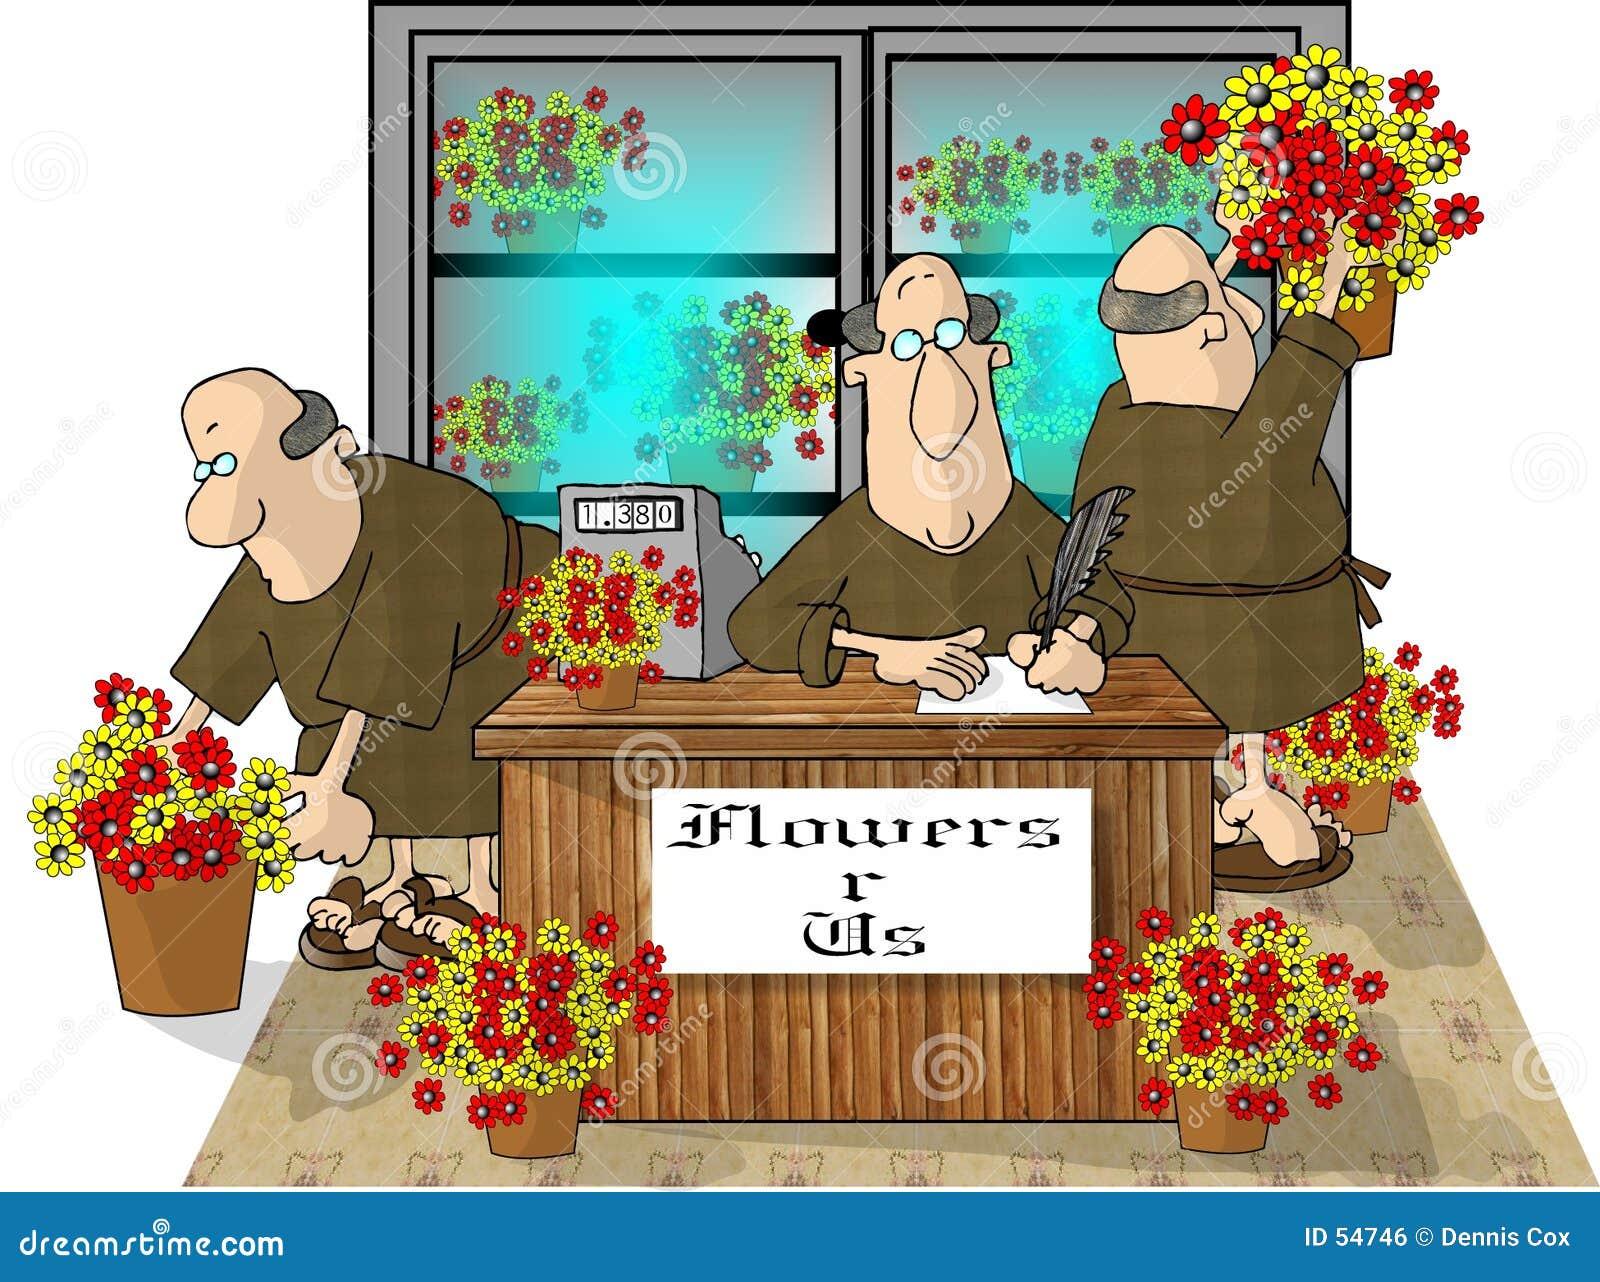 Solamente usted puede prevenir a frailes del florista